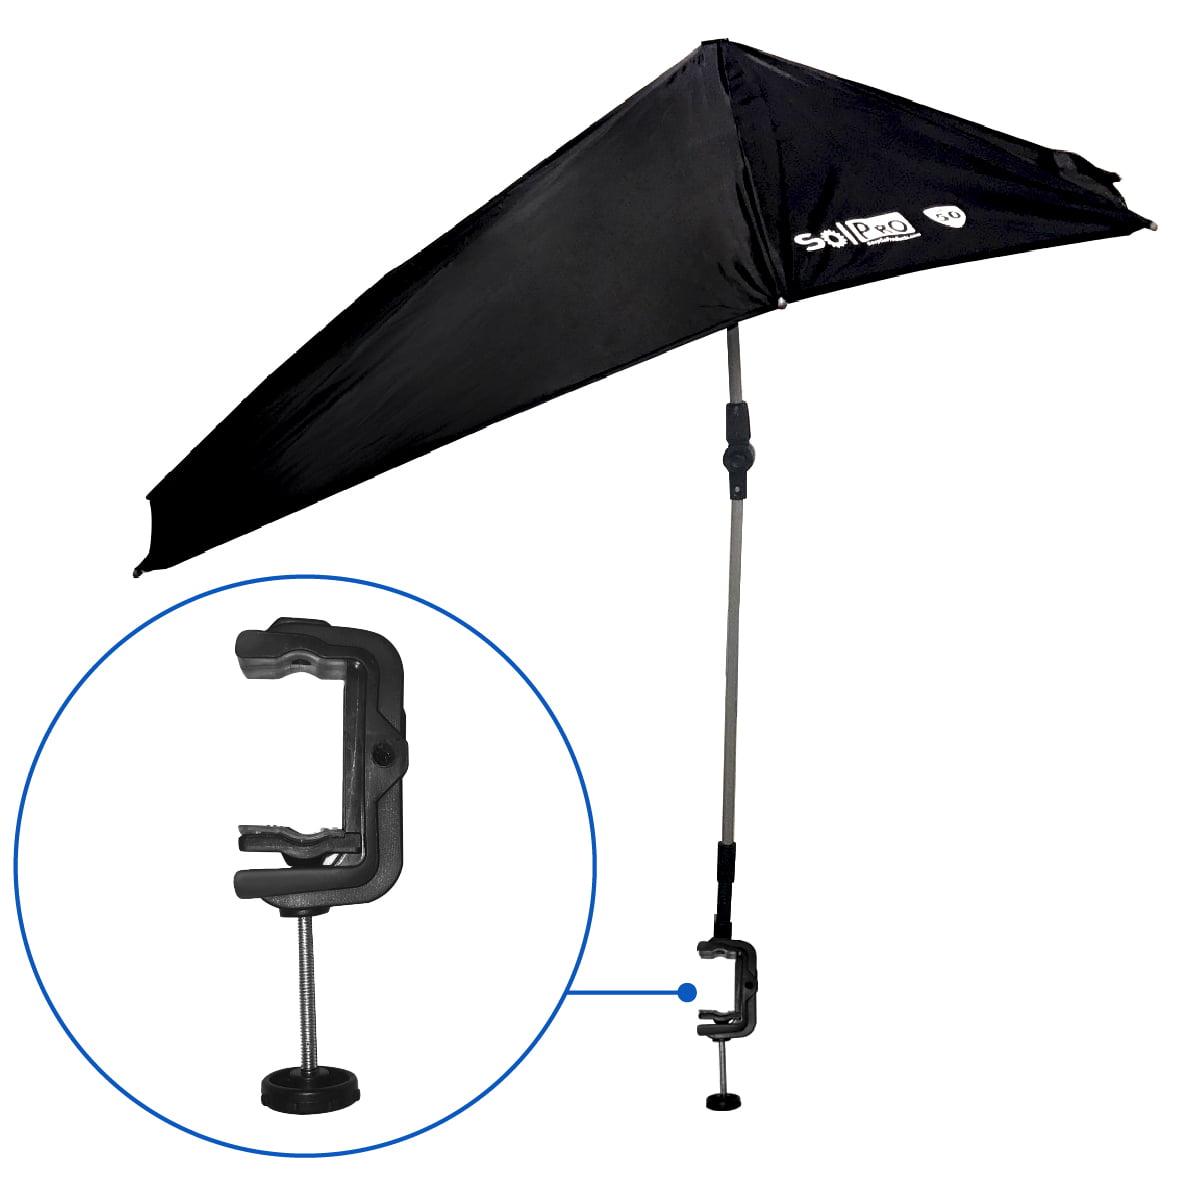 Solpro Clamp On Shade Umbrella 4 Way Clamp Umbrella With